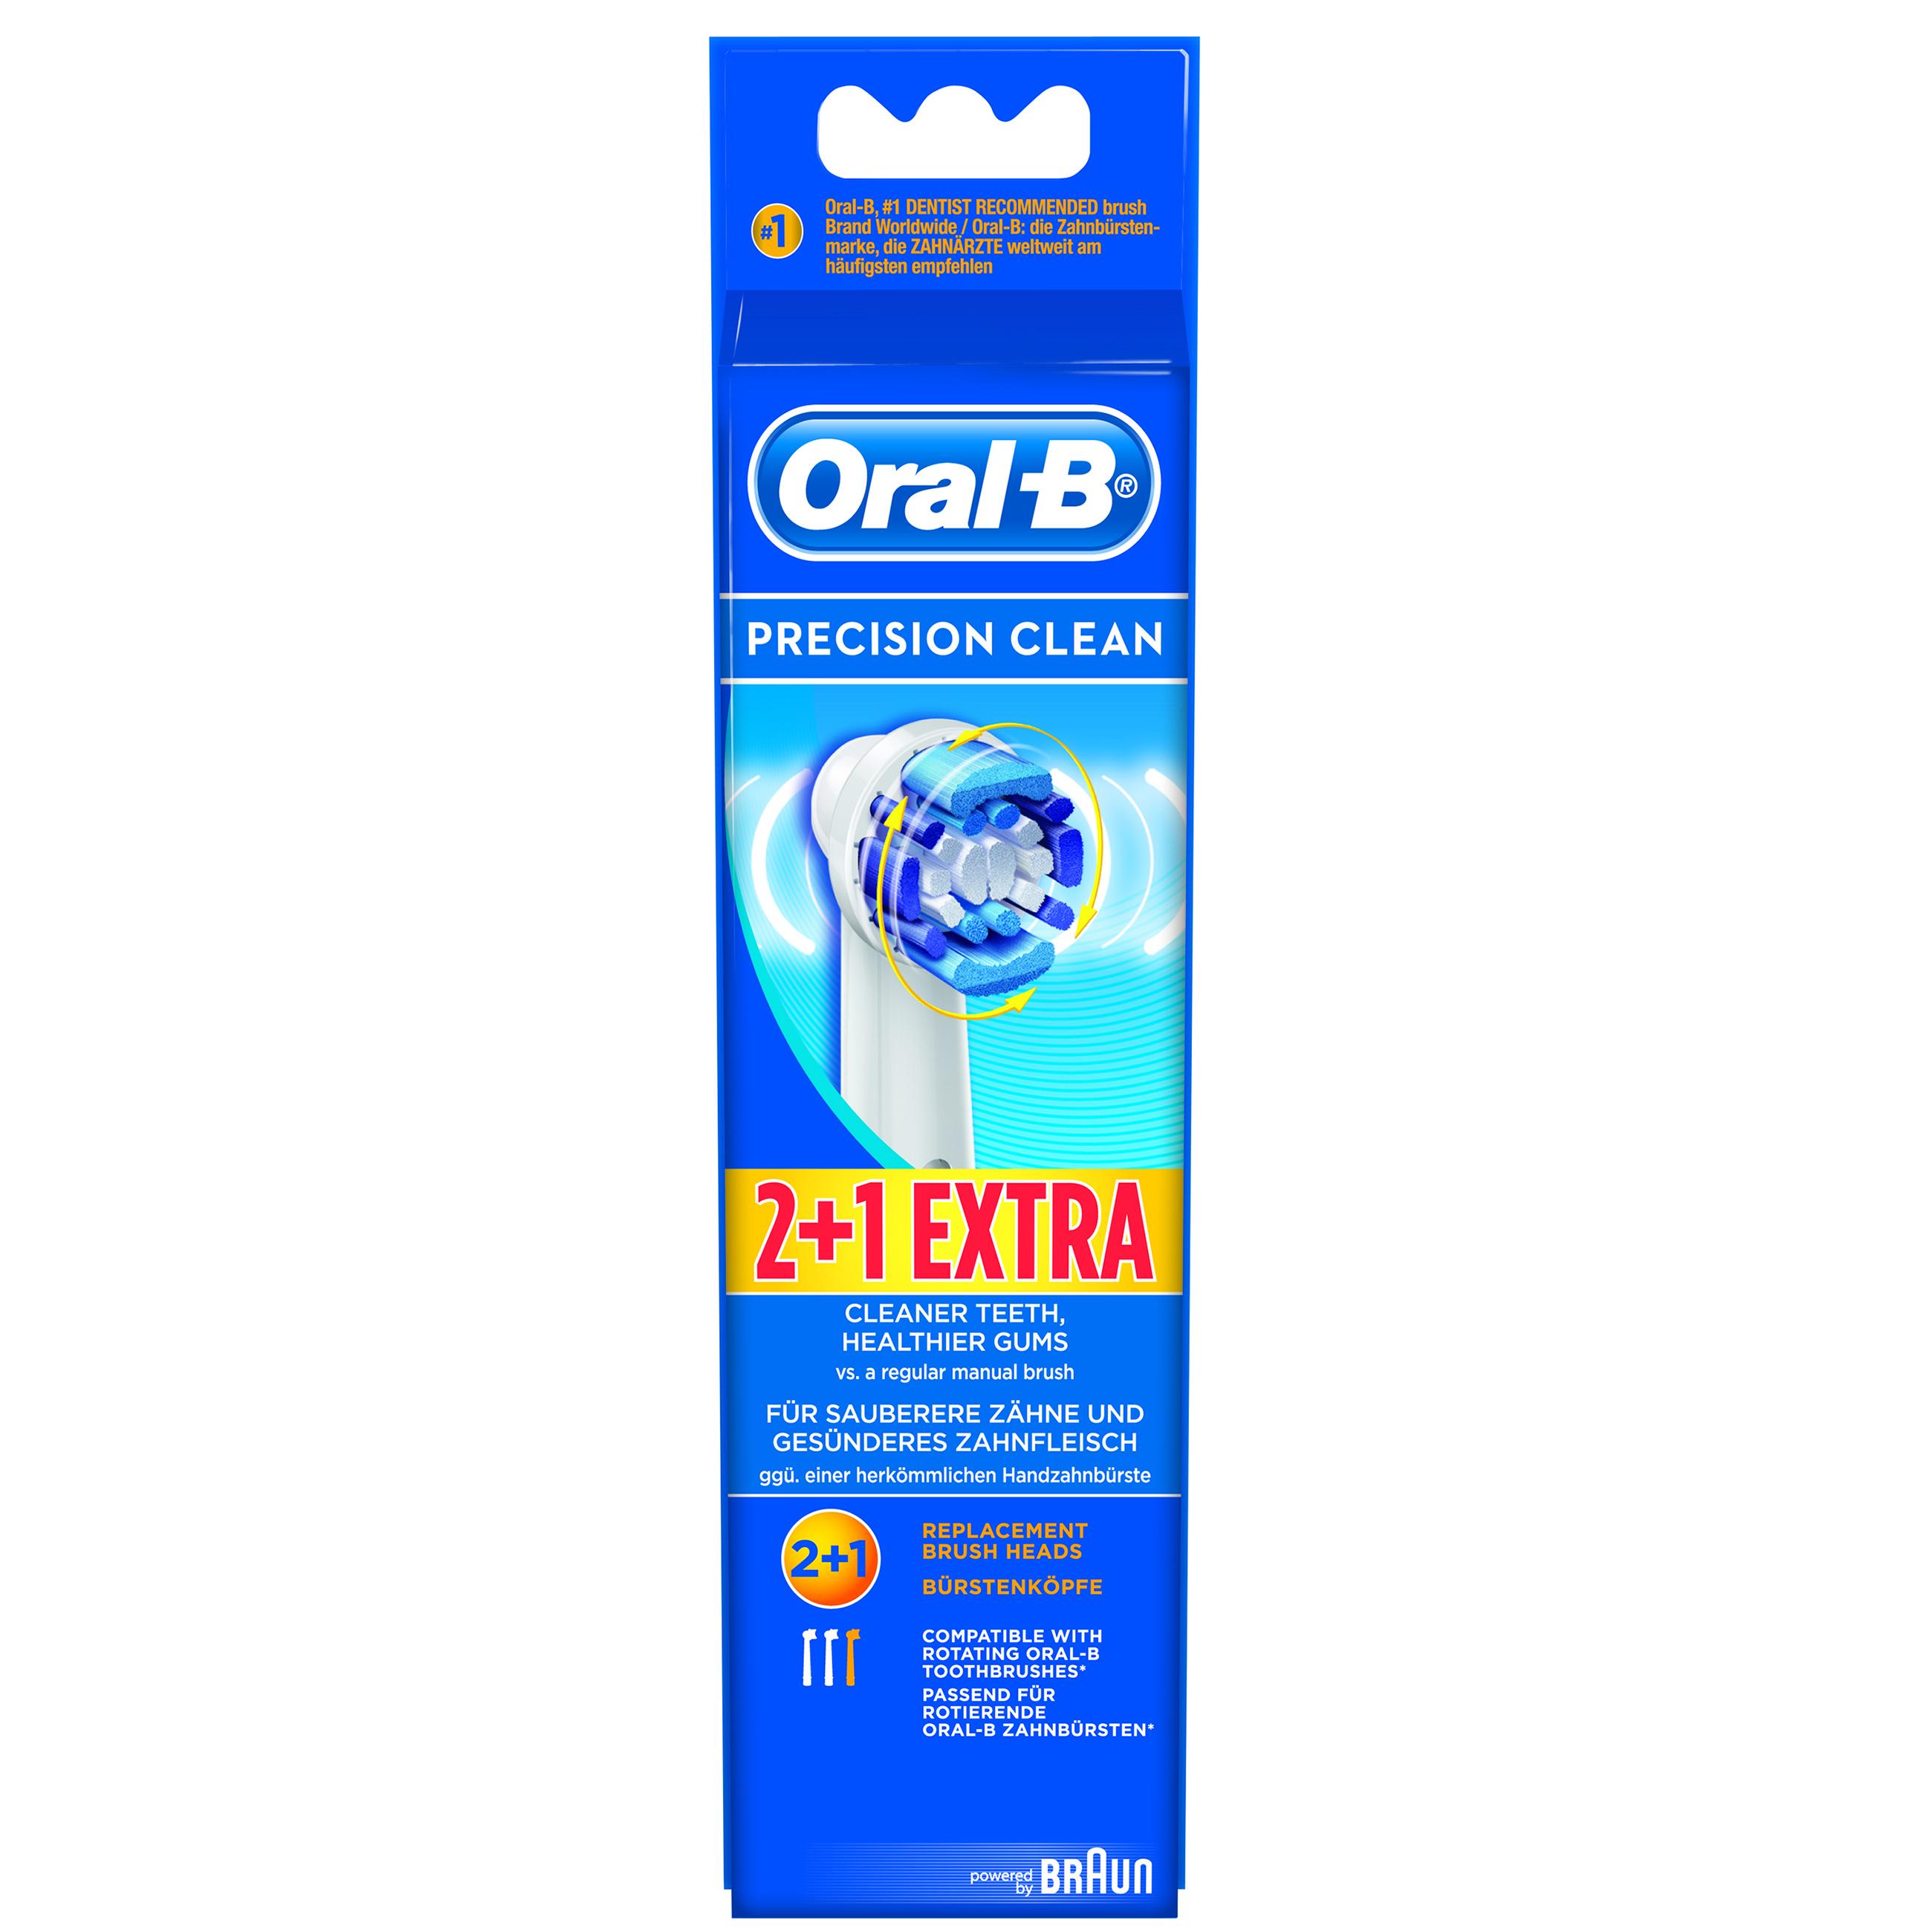 Oral-B Vitality Precision Clean Ανταλλακτικές Κεφαλές 2+1 Δώρο